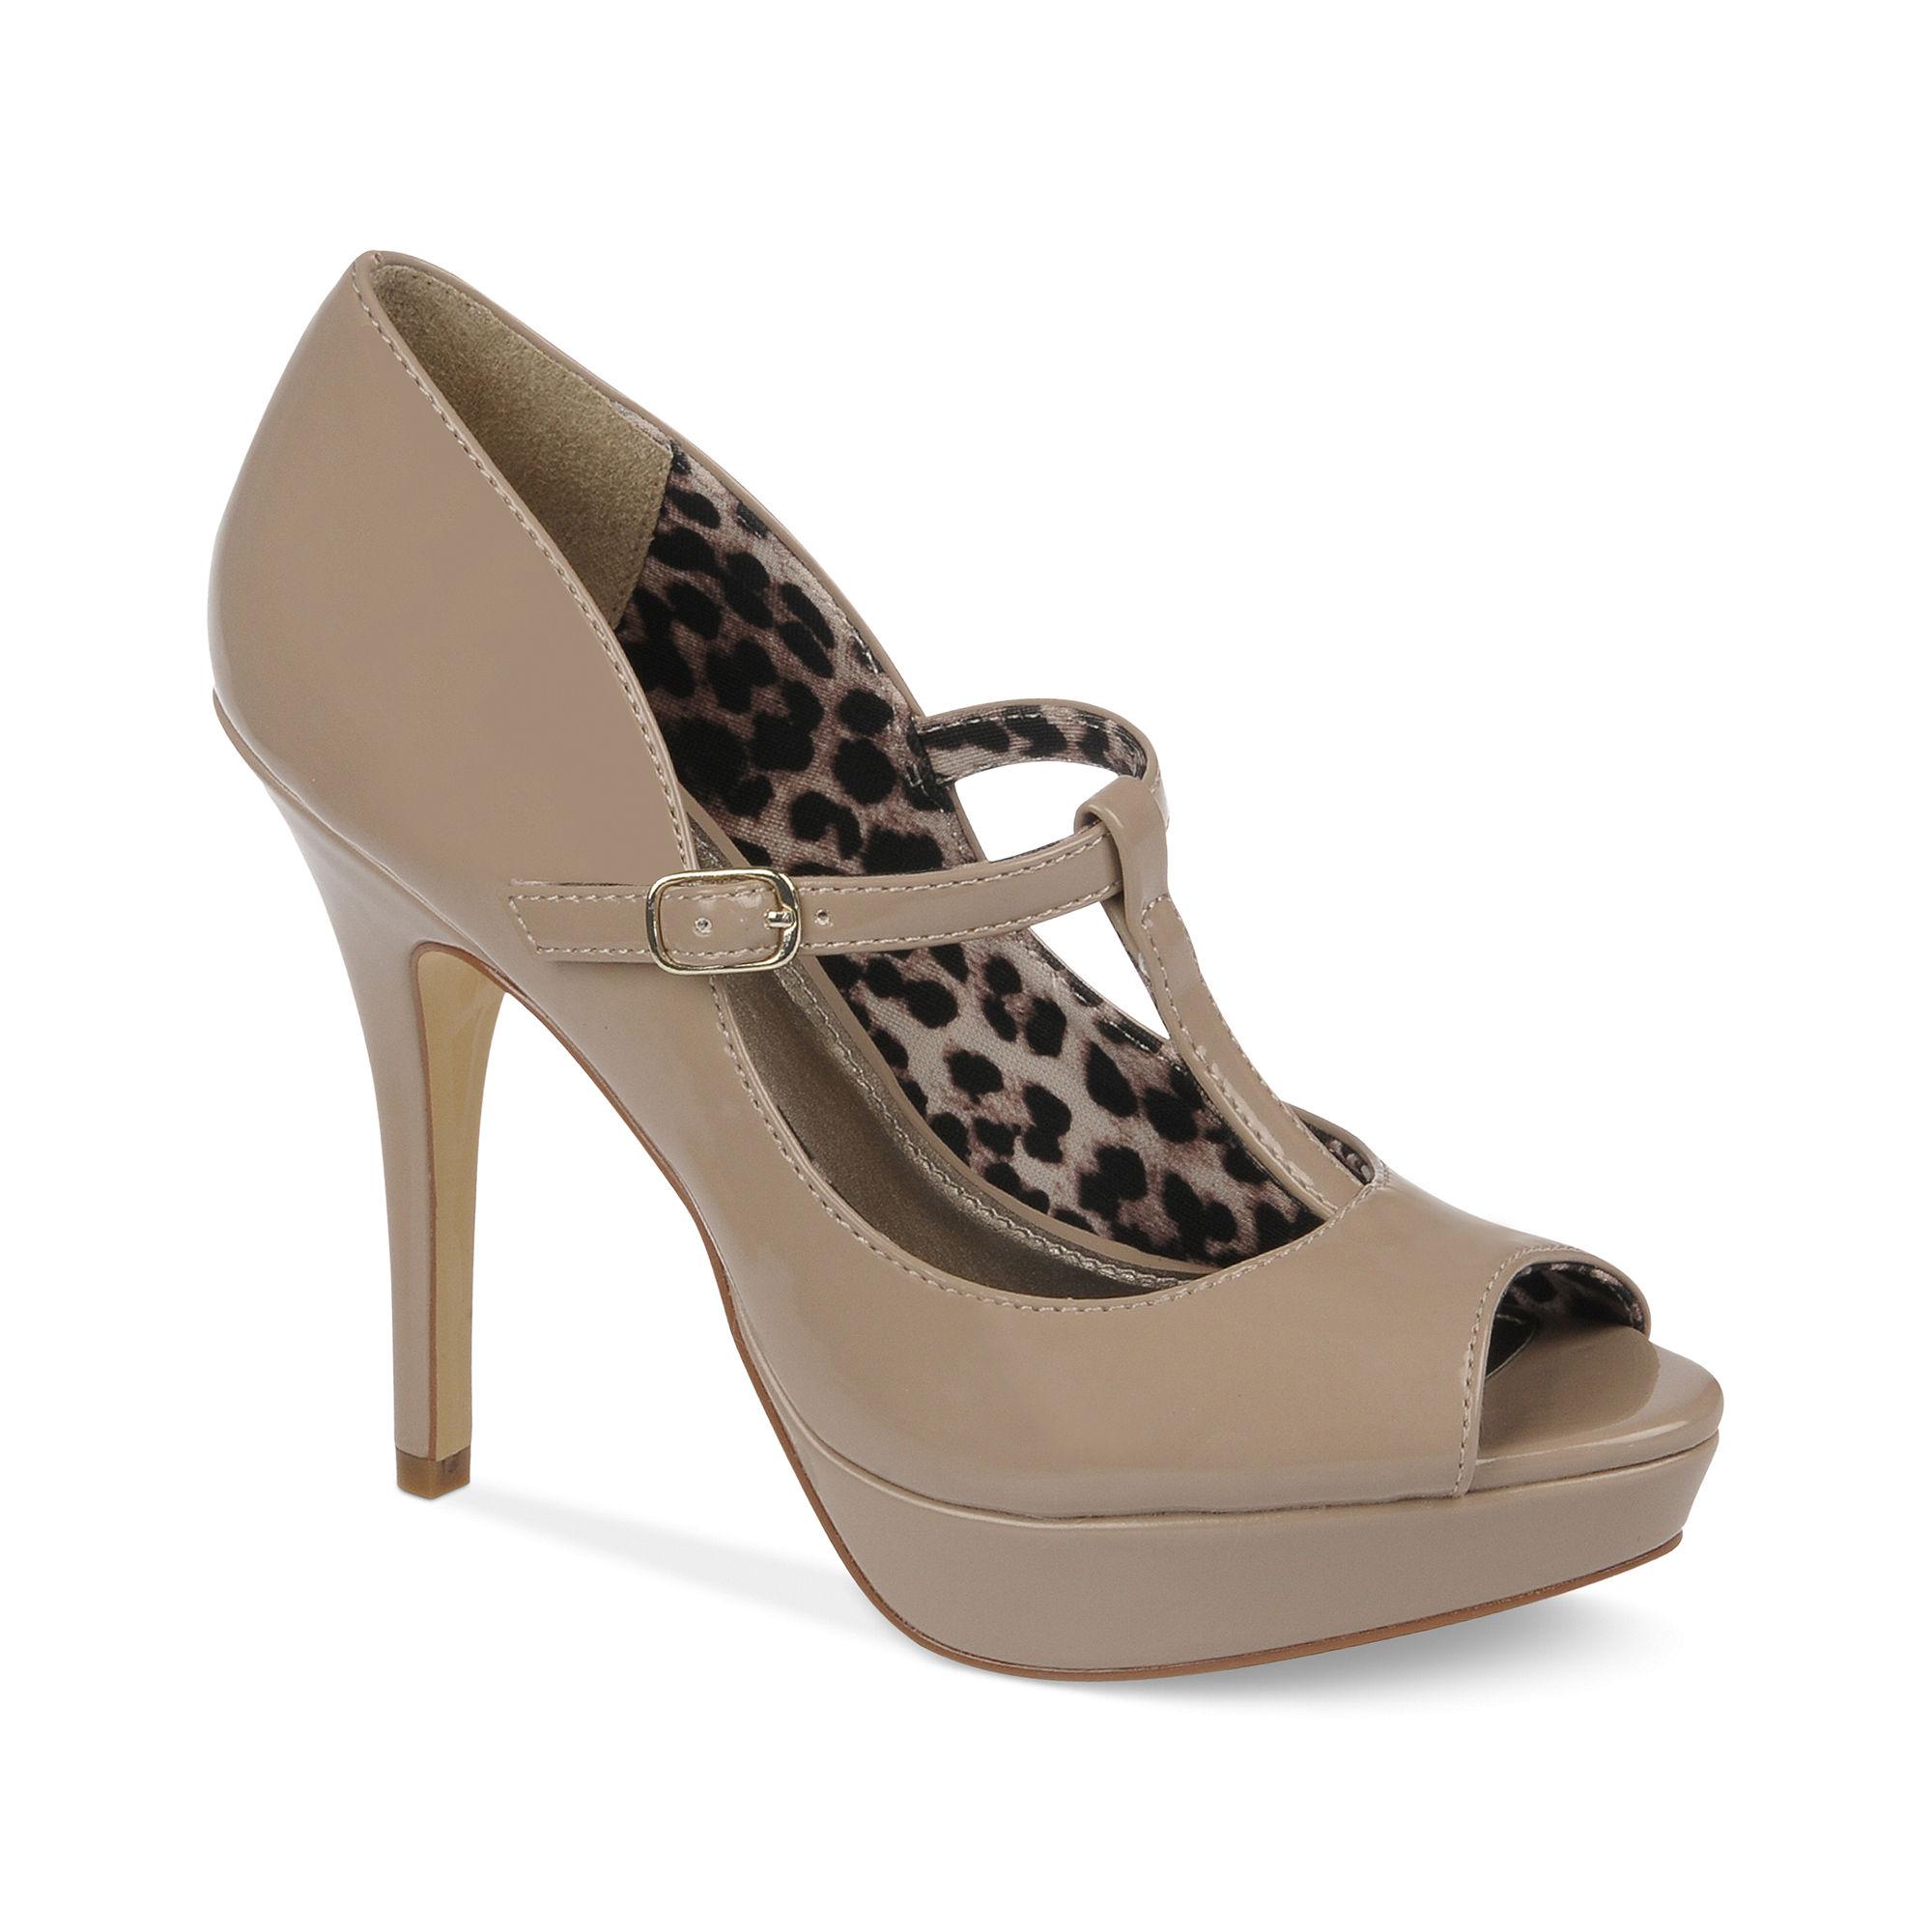 Fergie Fergalicious Shoes Excited Platform Pumps in Beige ... Fergie Shoes